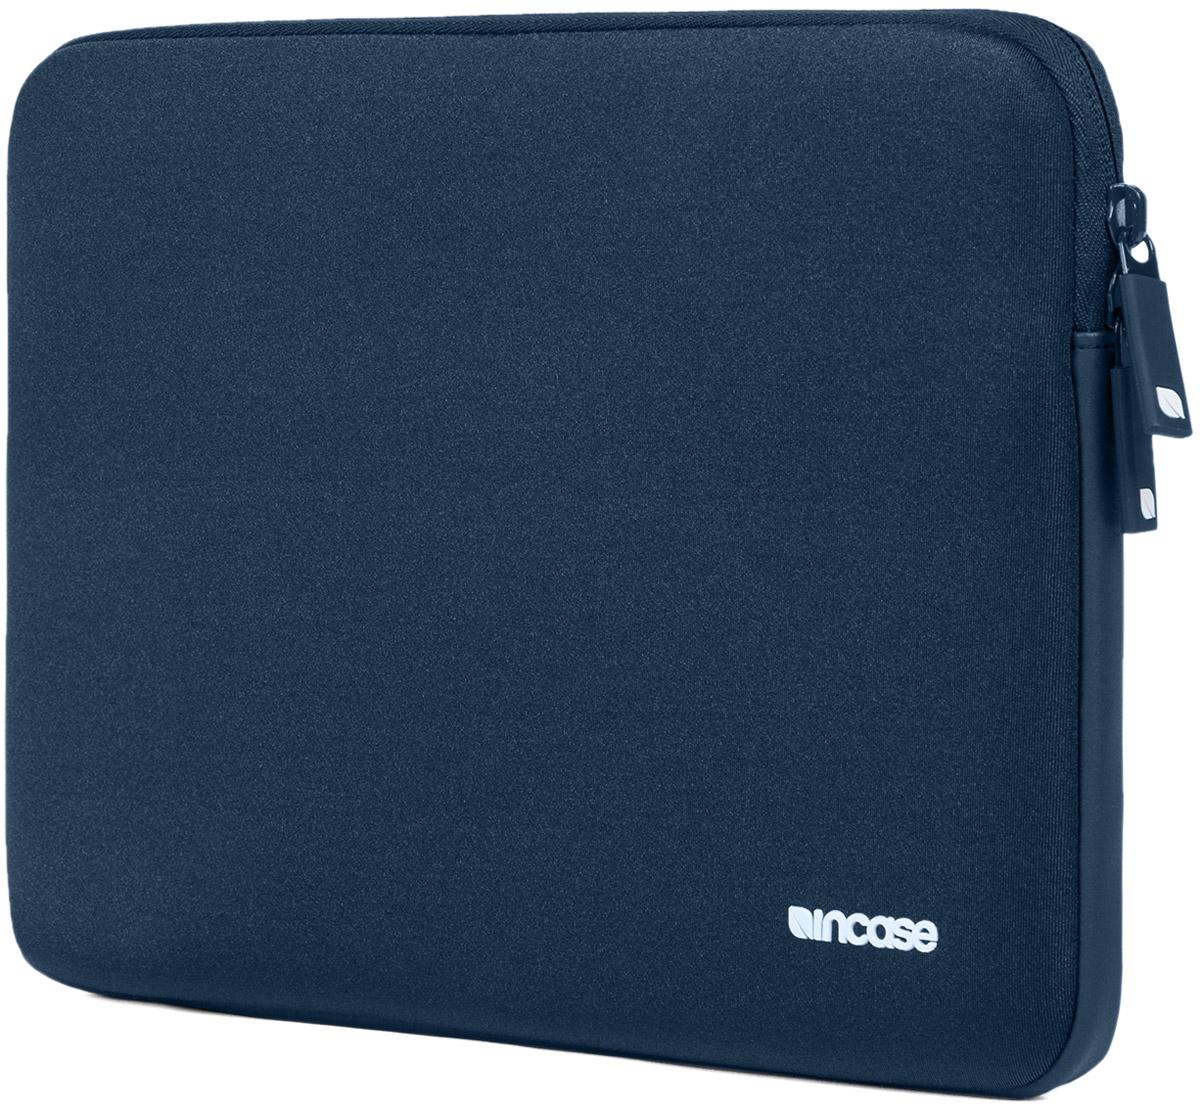 "Incase Neoprene Classic Sleeve чехол для Apple MacBook Air 11"", Midnight Blue"